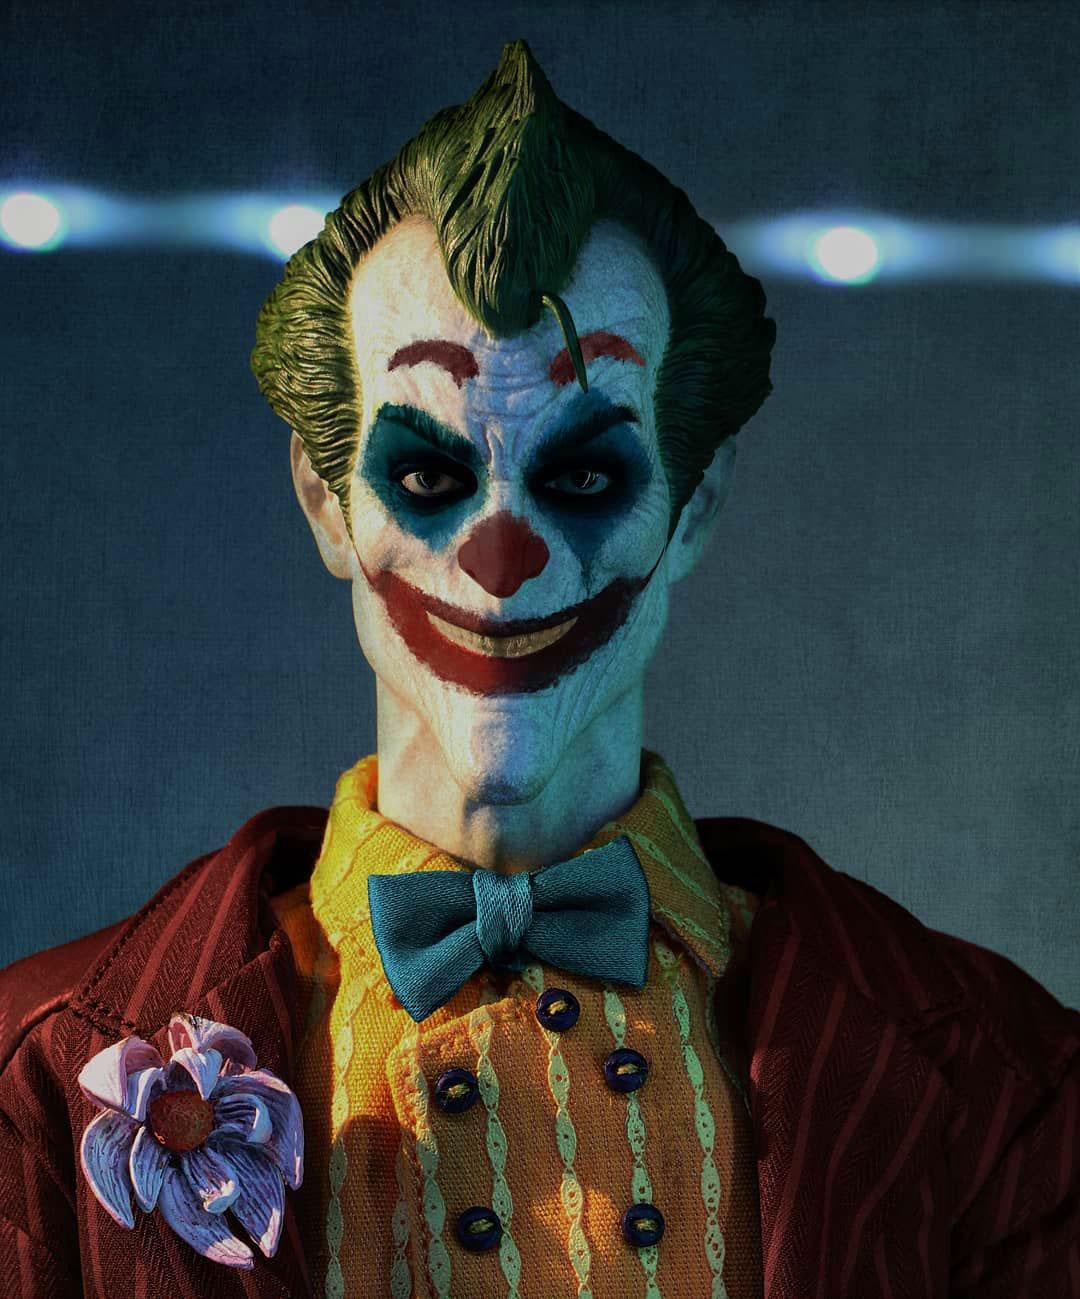 Joker Dp Images photo for download 2021